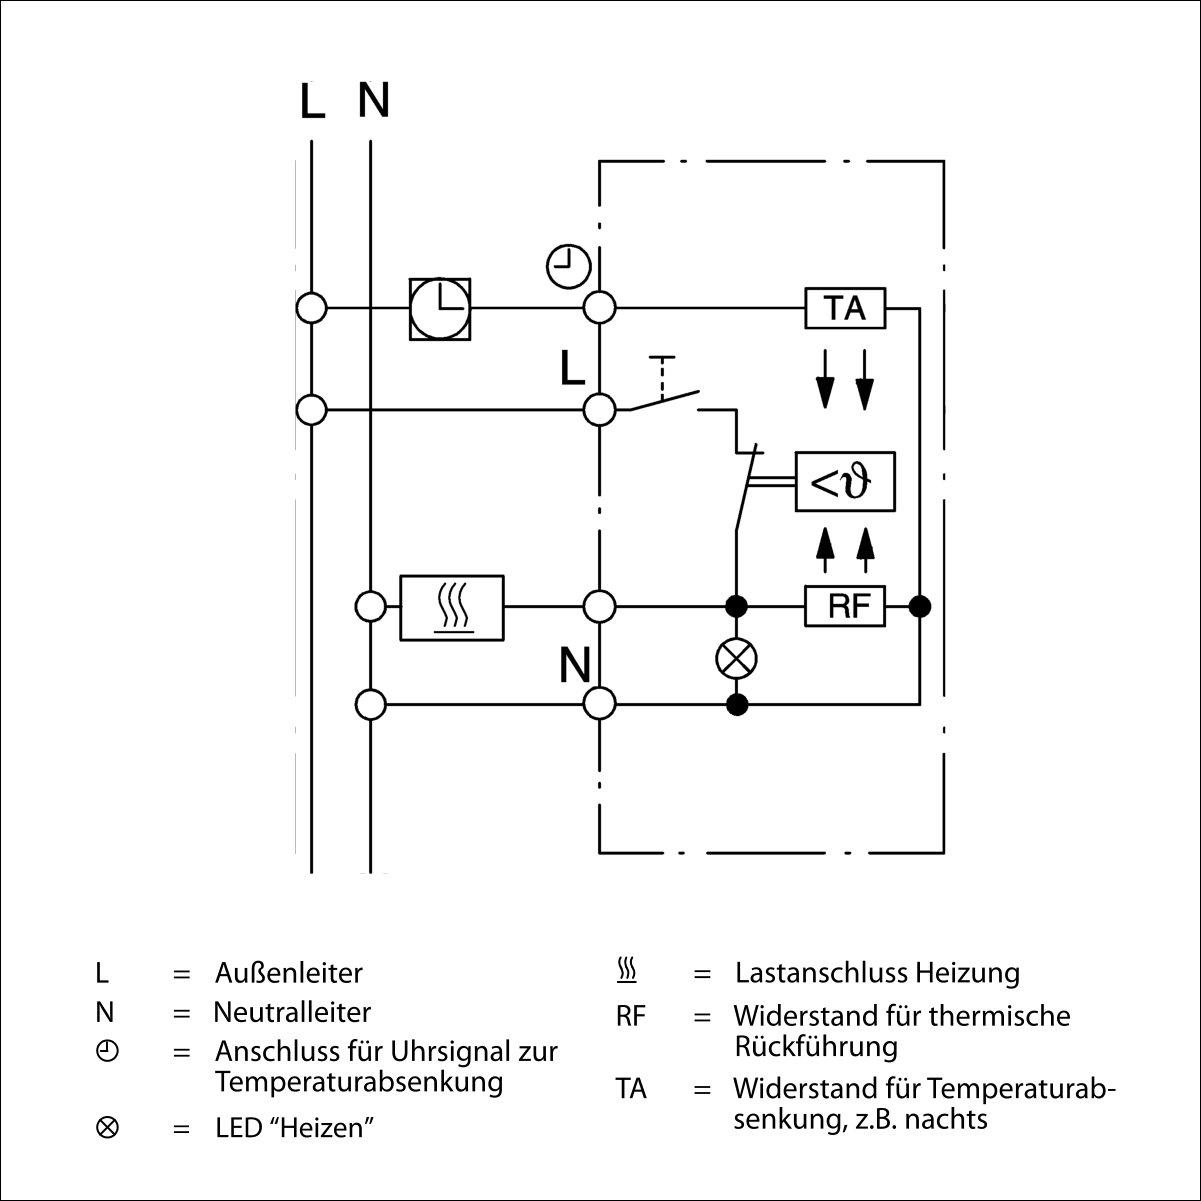 raumthermostat f r fu bodenheizung mit merten 1 m rahmen. Black Bedroom Furniture Sets. Home Design Ideas